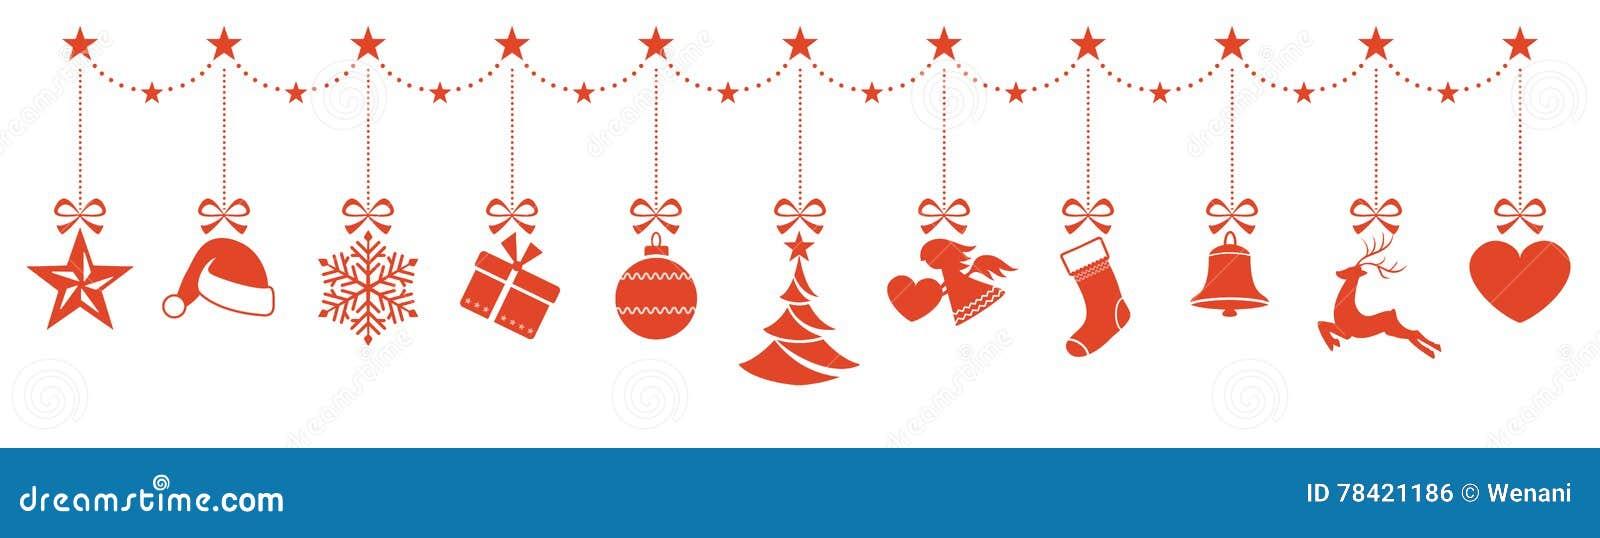 border of hanging christmas ornaments stock vector. Black Bedroom Furniture Sets. Home Design Ideas